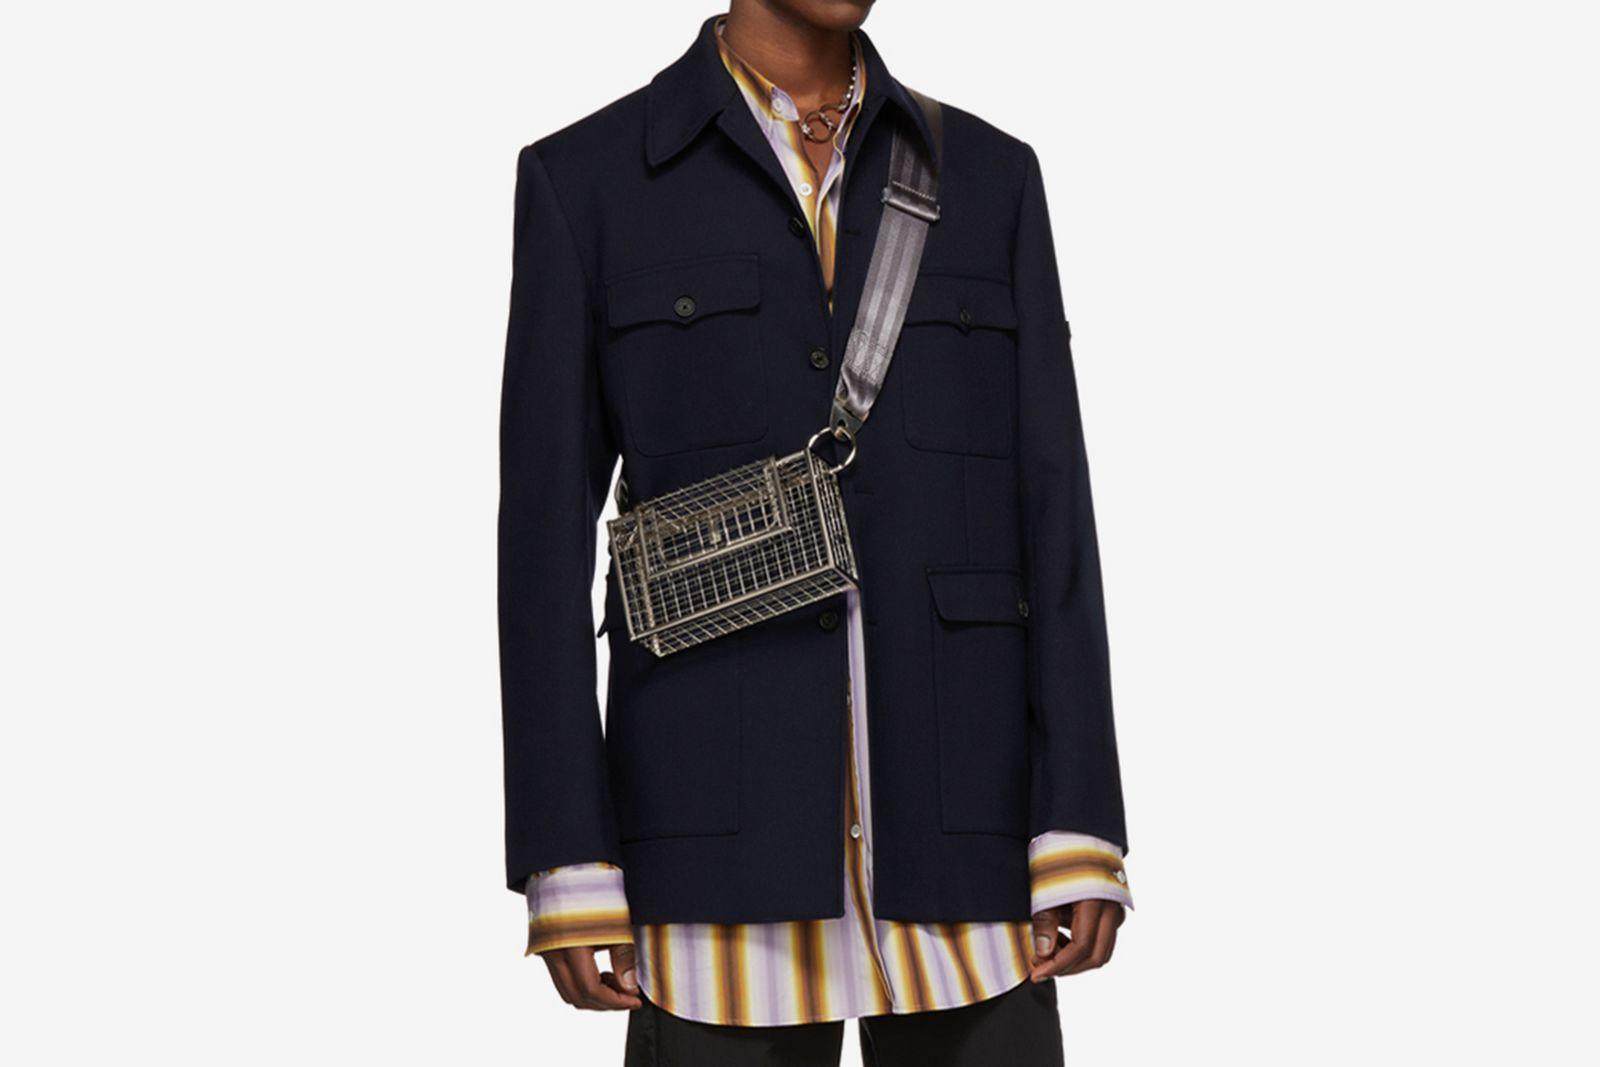 COLOR MATCHINGcm shirtcm jacket martine ali ssense